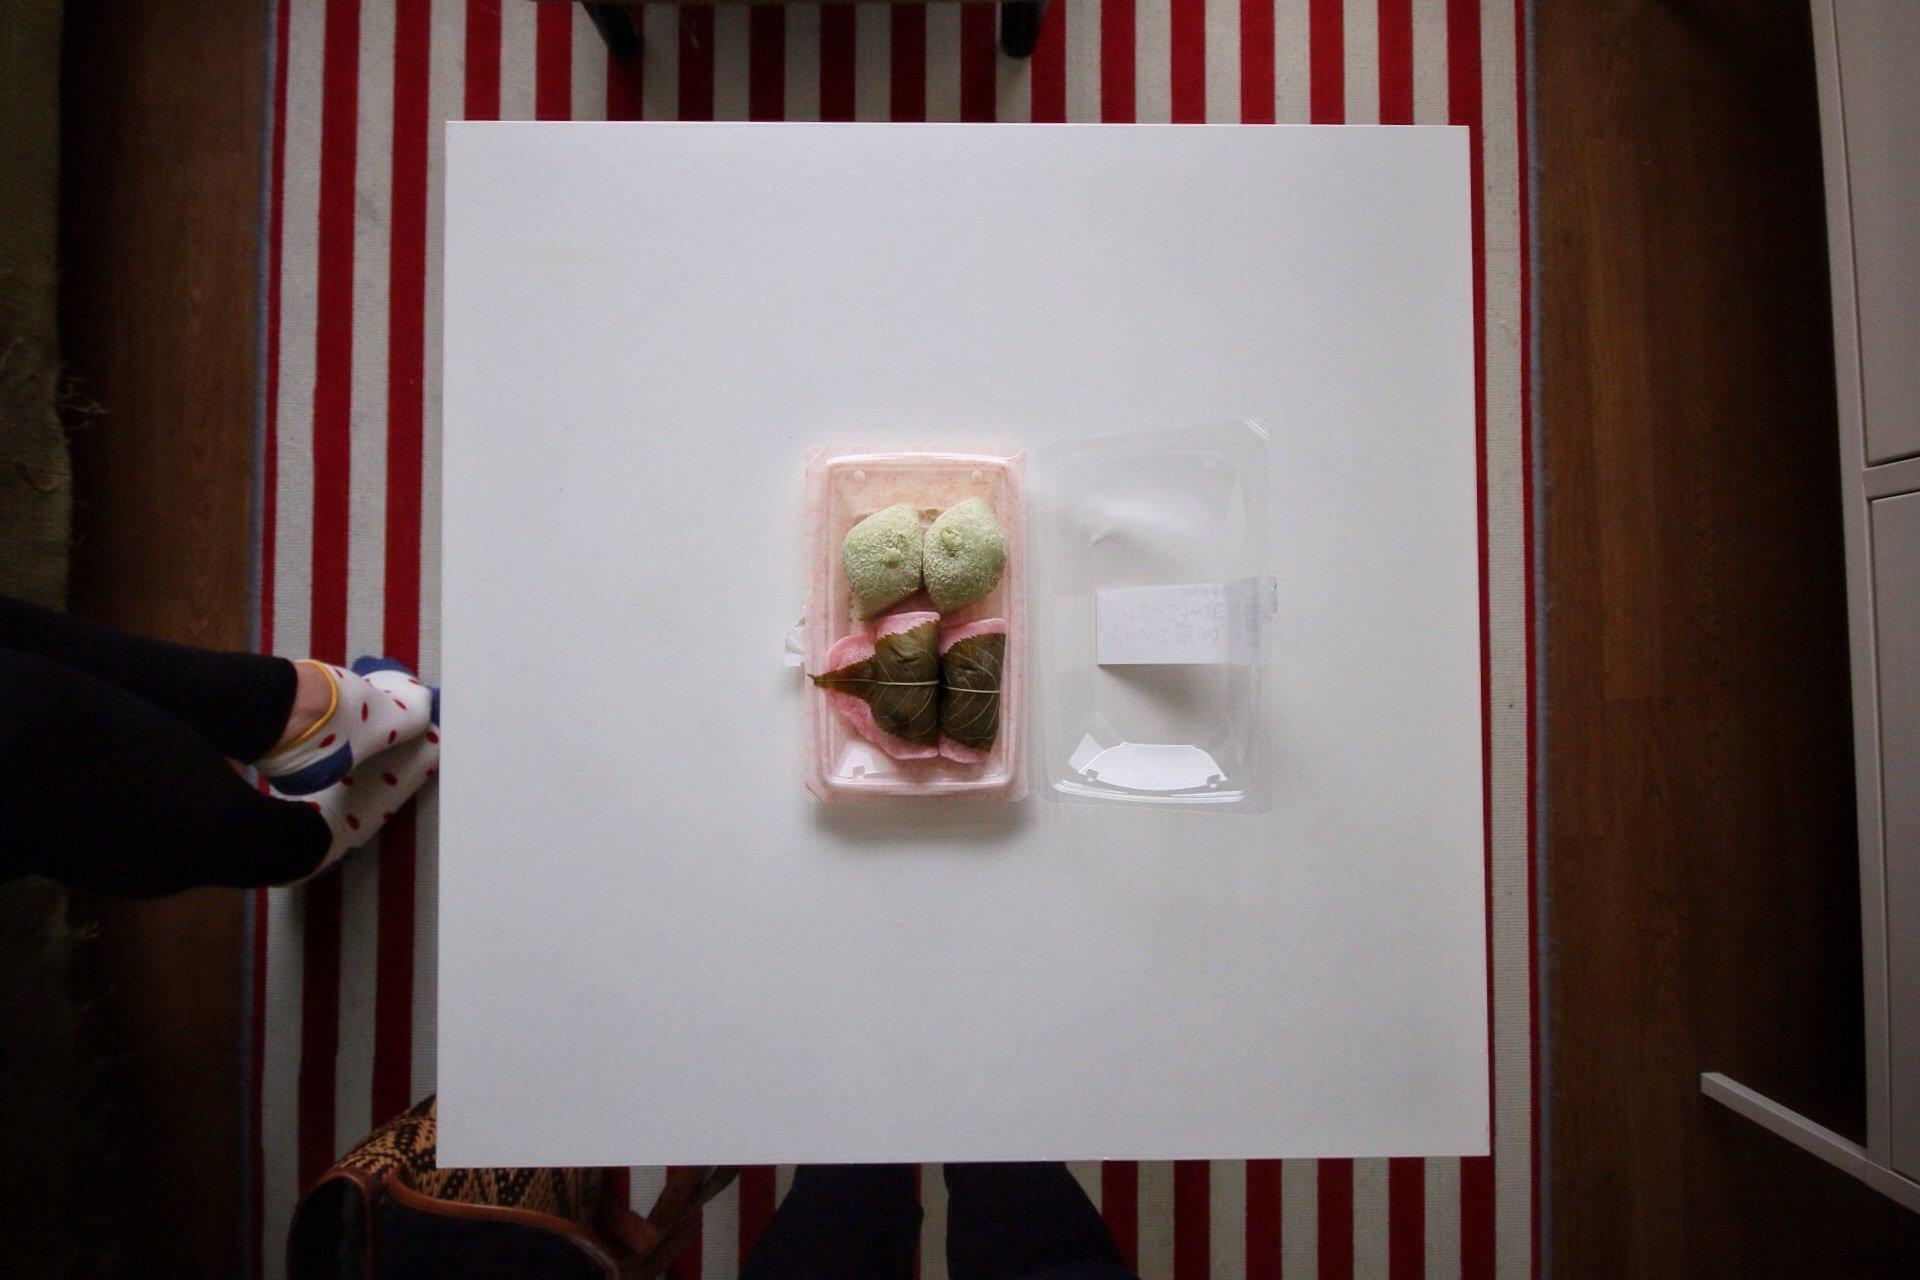 tokyo-sakura-dessert-2-kasuma-photo-blog